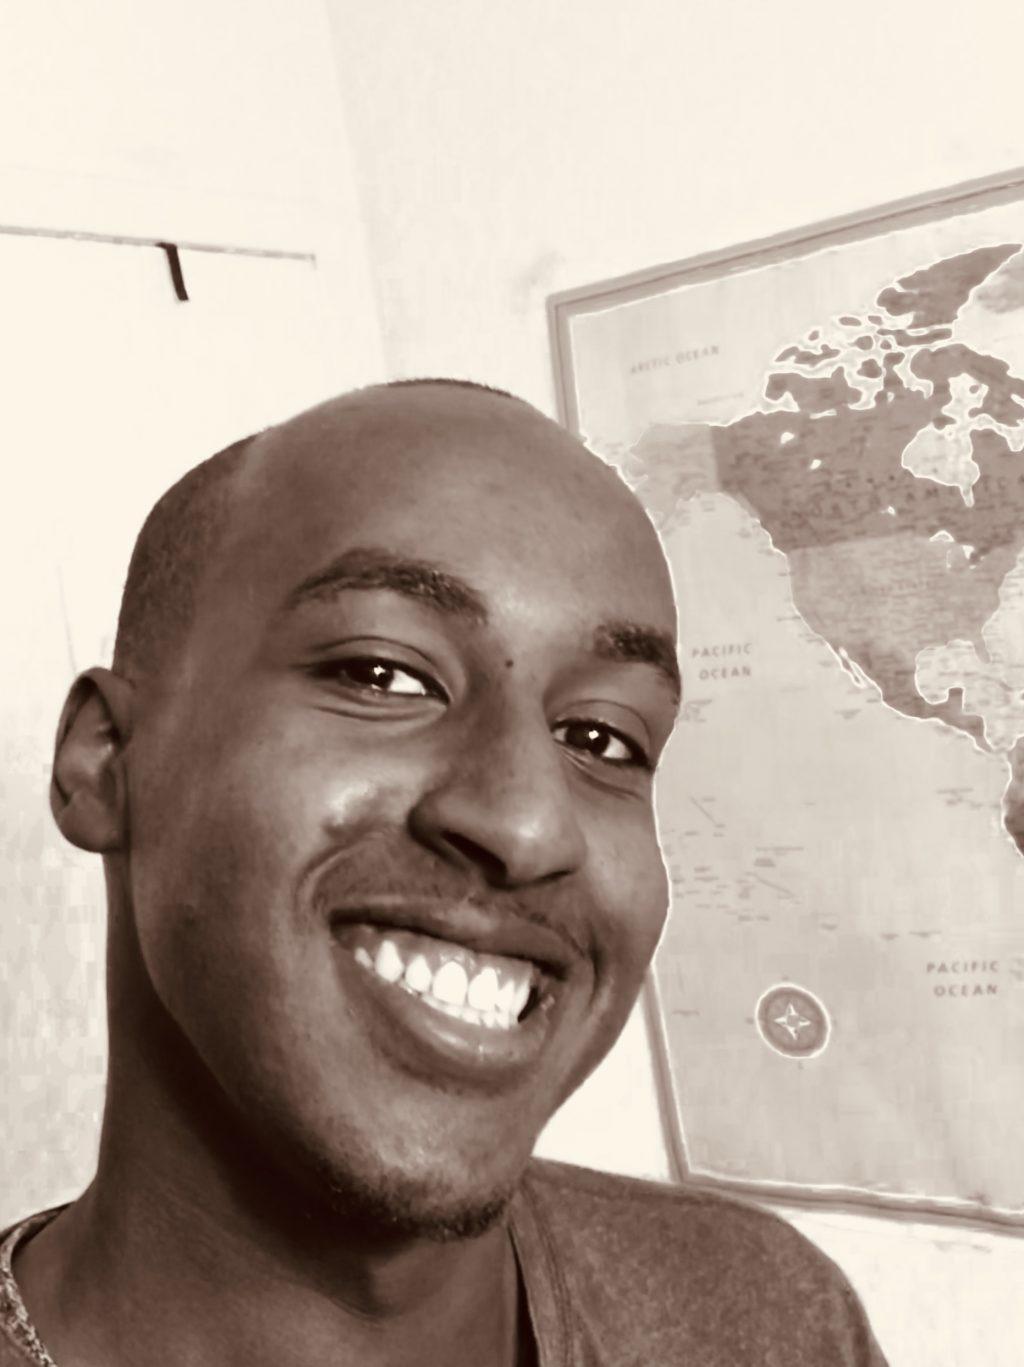 Personal Trainer San-diego, California - Abdullahi Ahmed